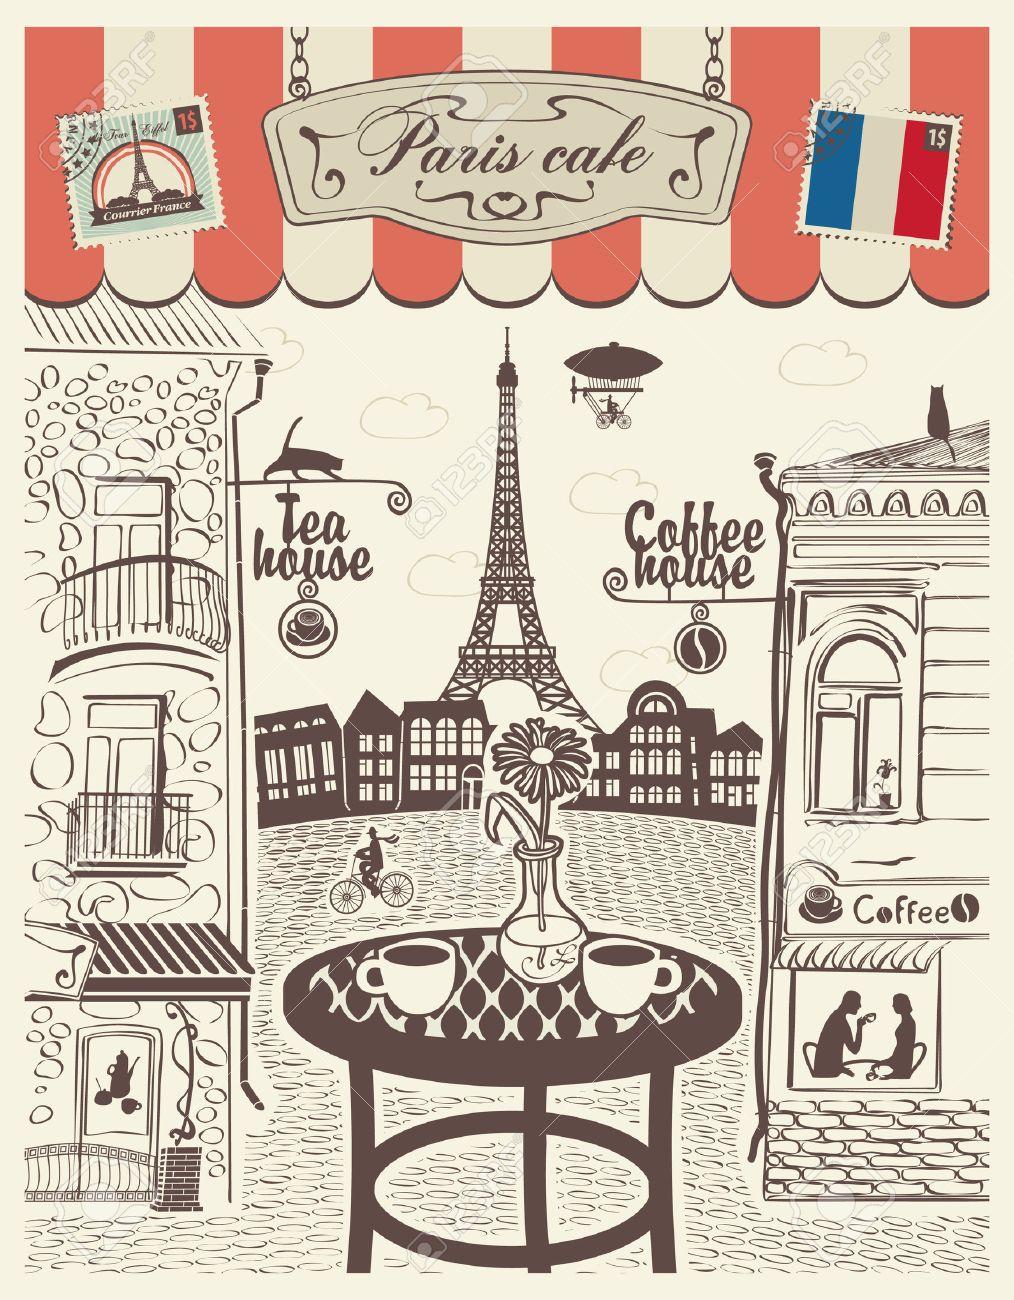 Parisian street restaurant with views of the Eiffel Tower - 24196186